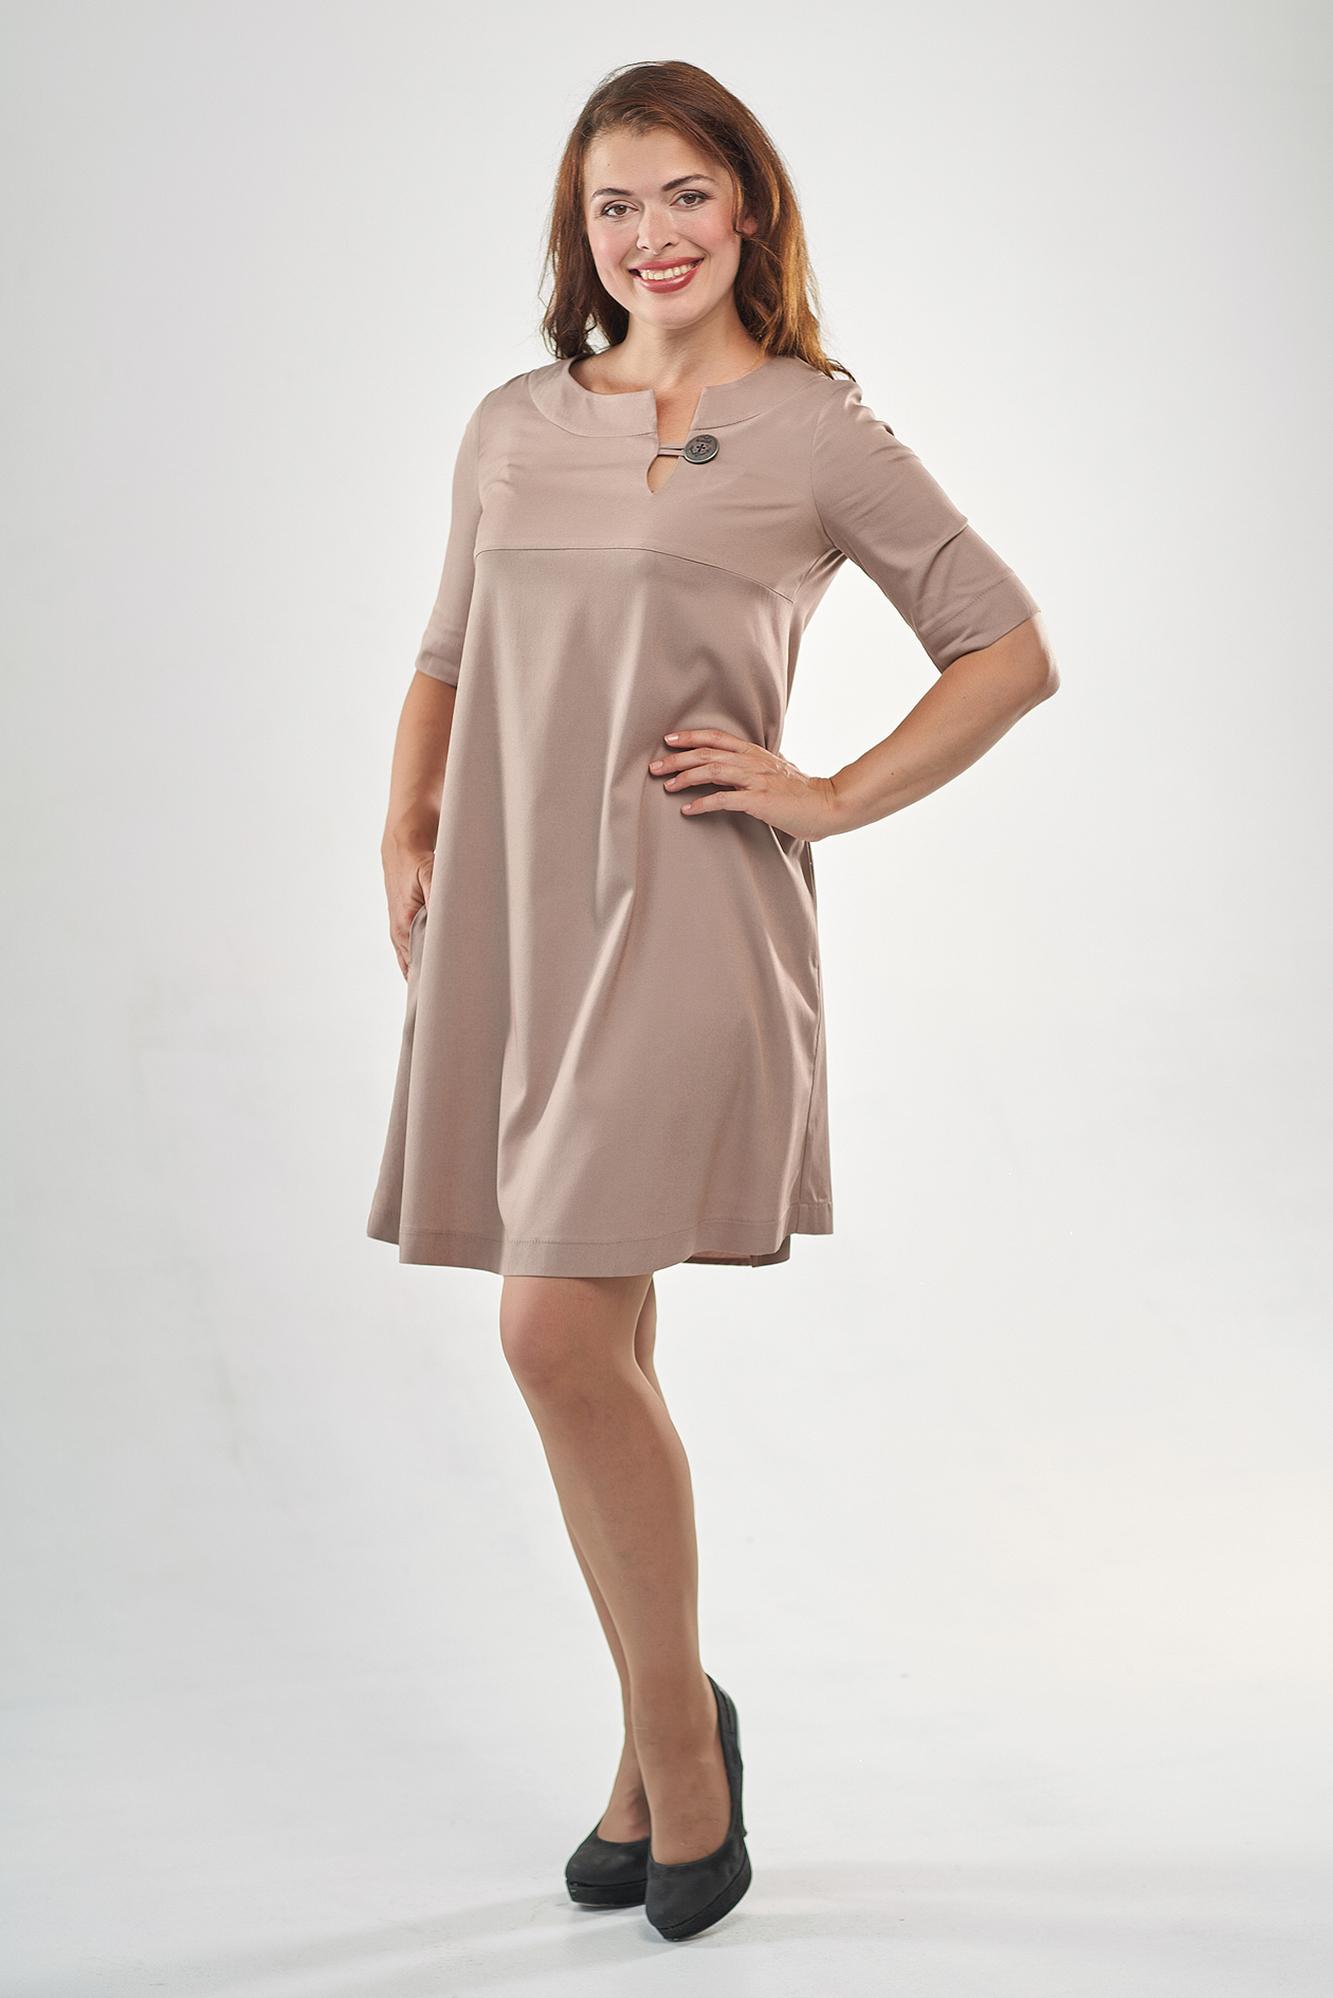 MSBASIC Womens Deep V Neck Dress Short Sleeve Ruched Draped Party Dress